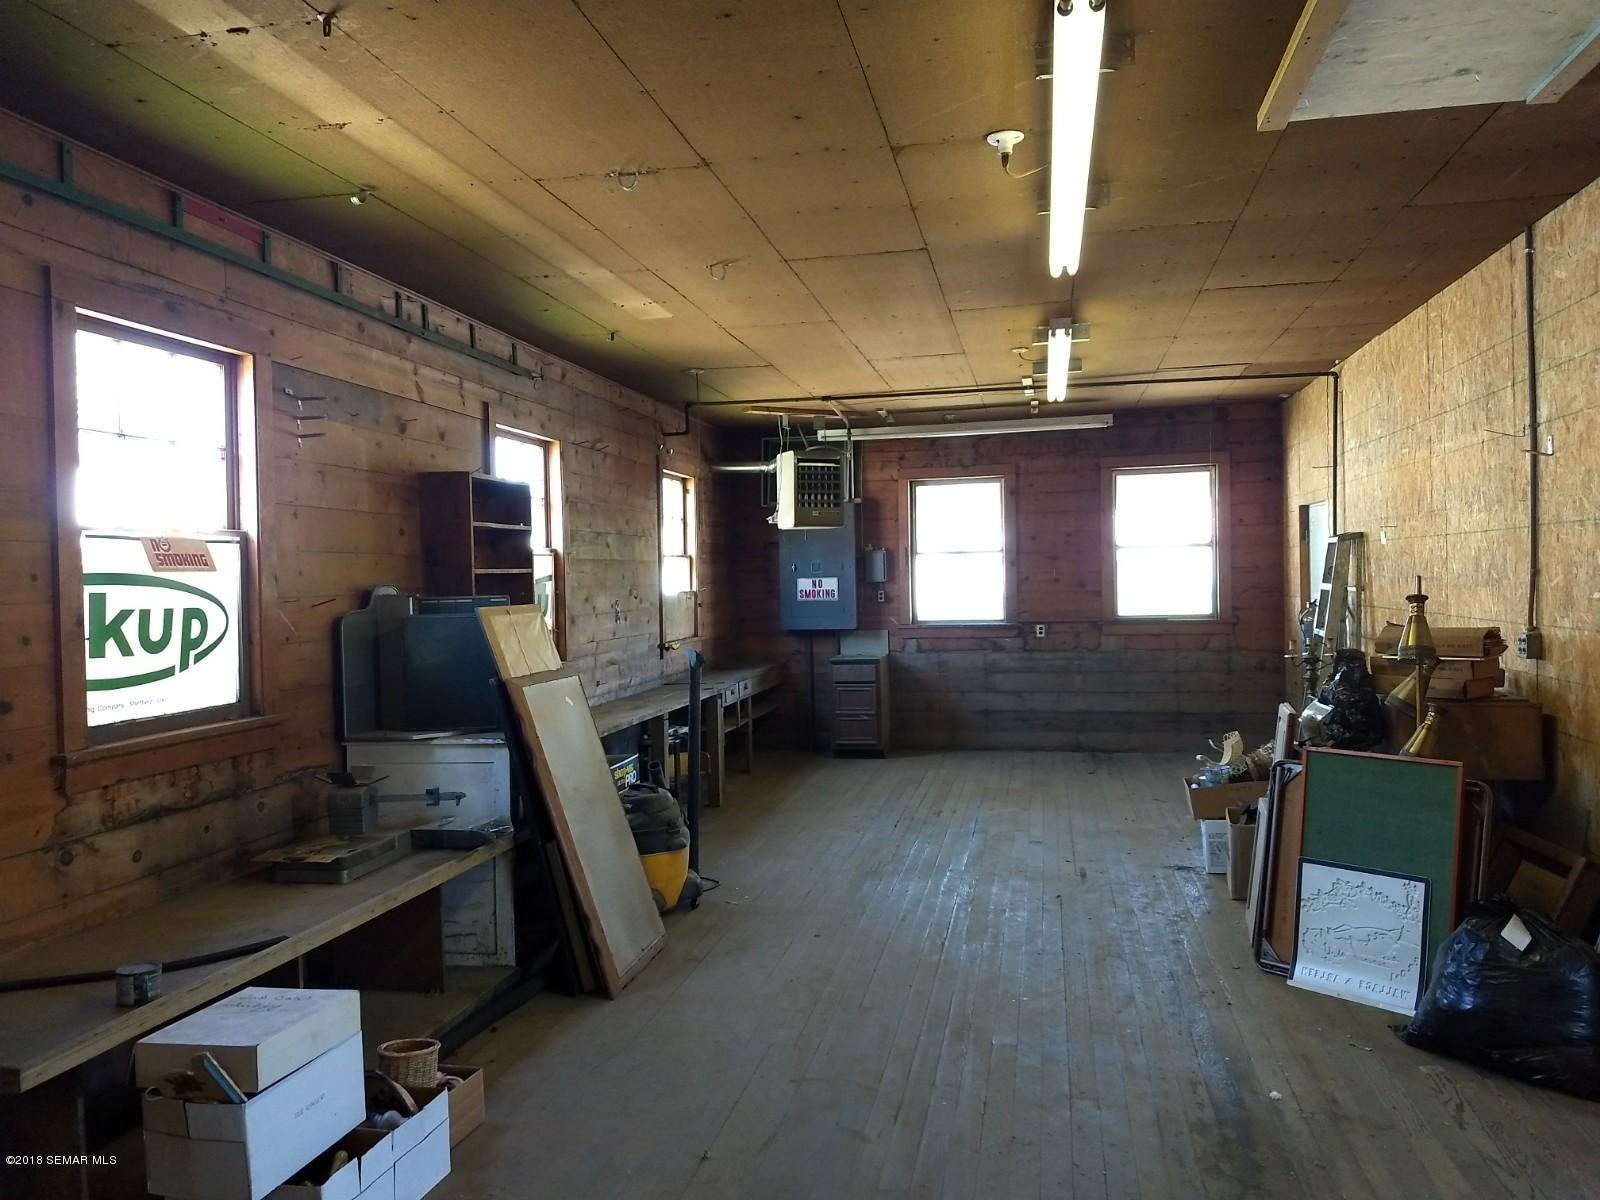 307 Industrial Drive Drive Rushford, MN 55971 - MLS #: 4089238